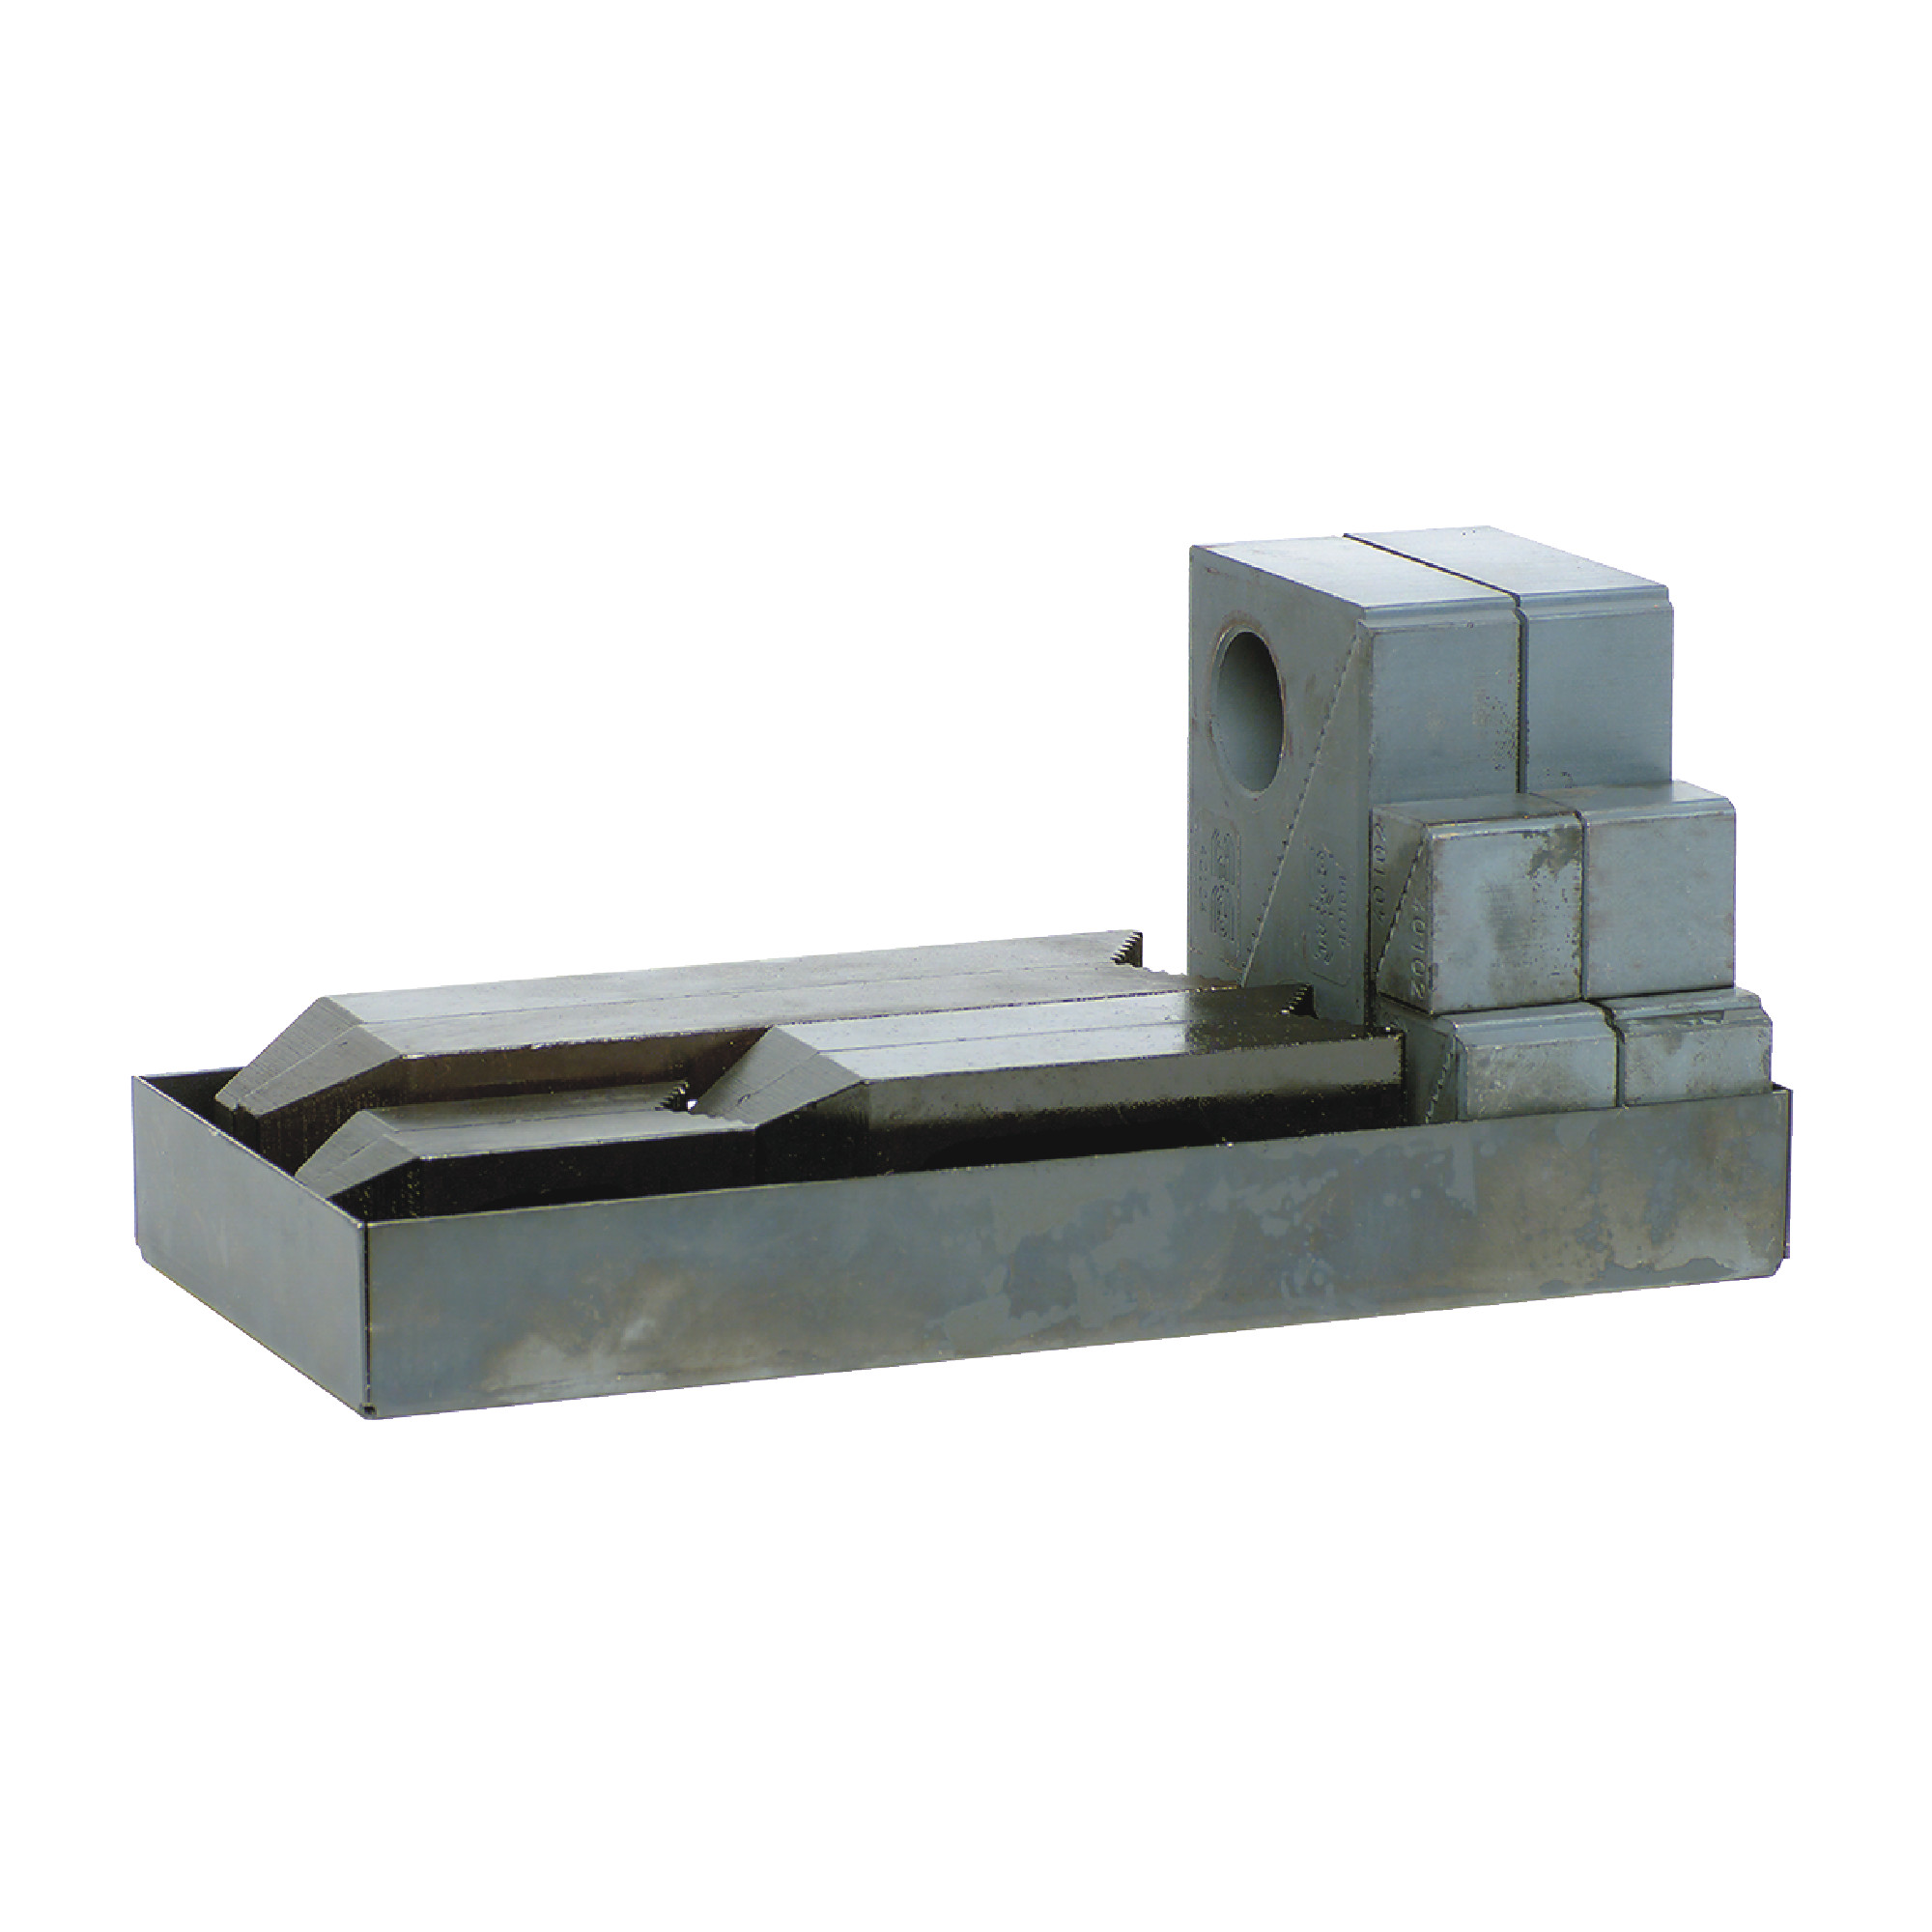 All Steel Step Block & Clamp Set